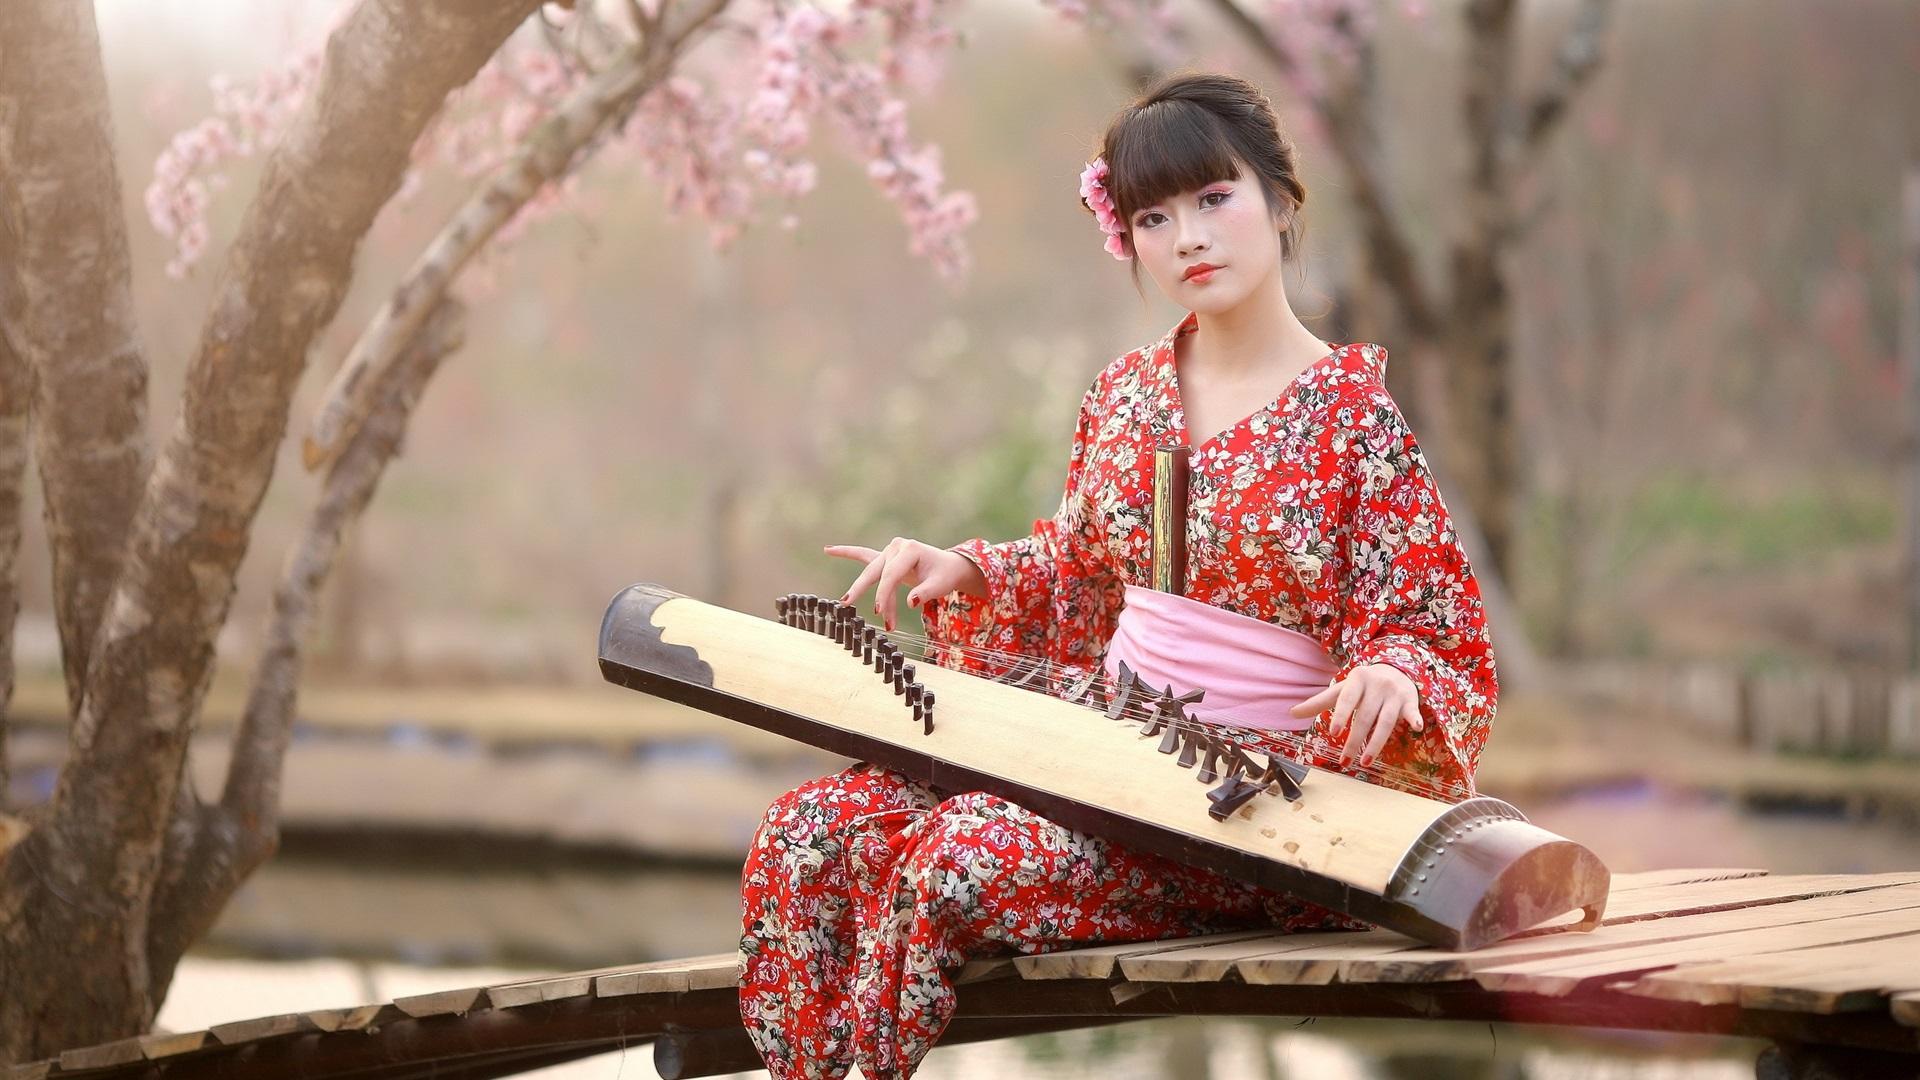 Wallpaper Japan Girl Kimono Music 2560x1600 Hd Picture Image